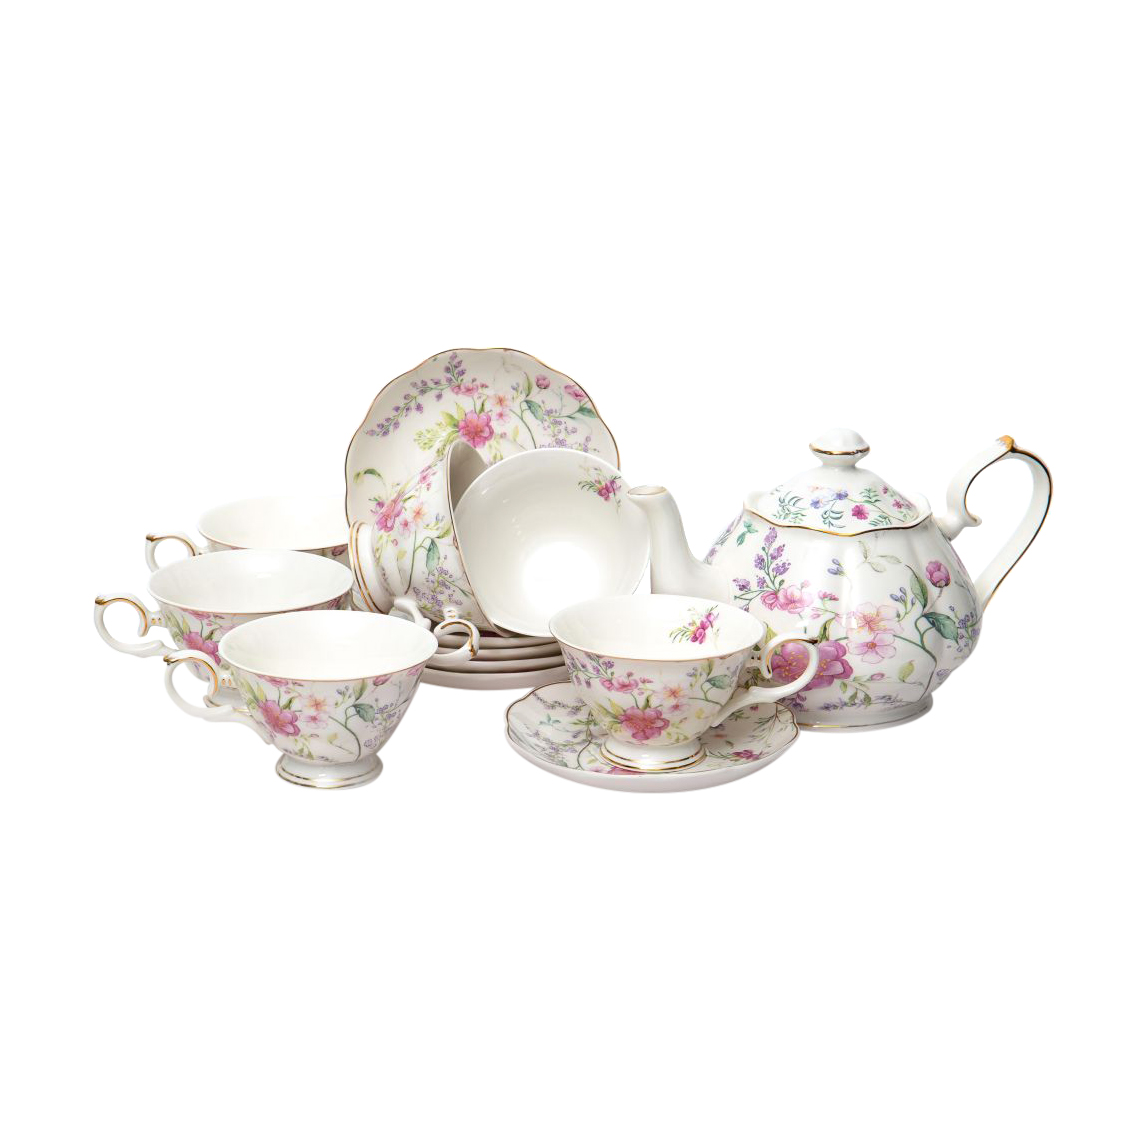 Набор чайный Balsford Аглая 13 предметов аглая отрада судьба по наследству